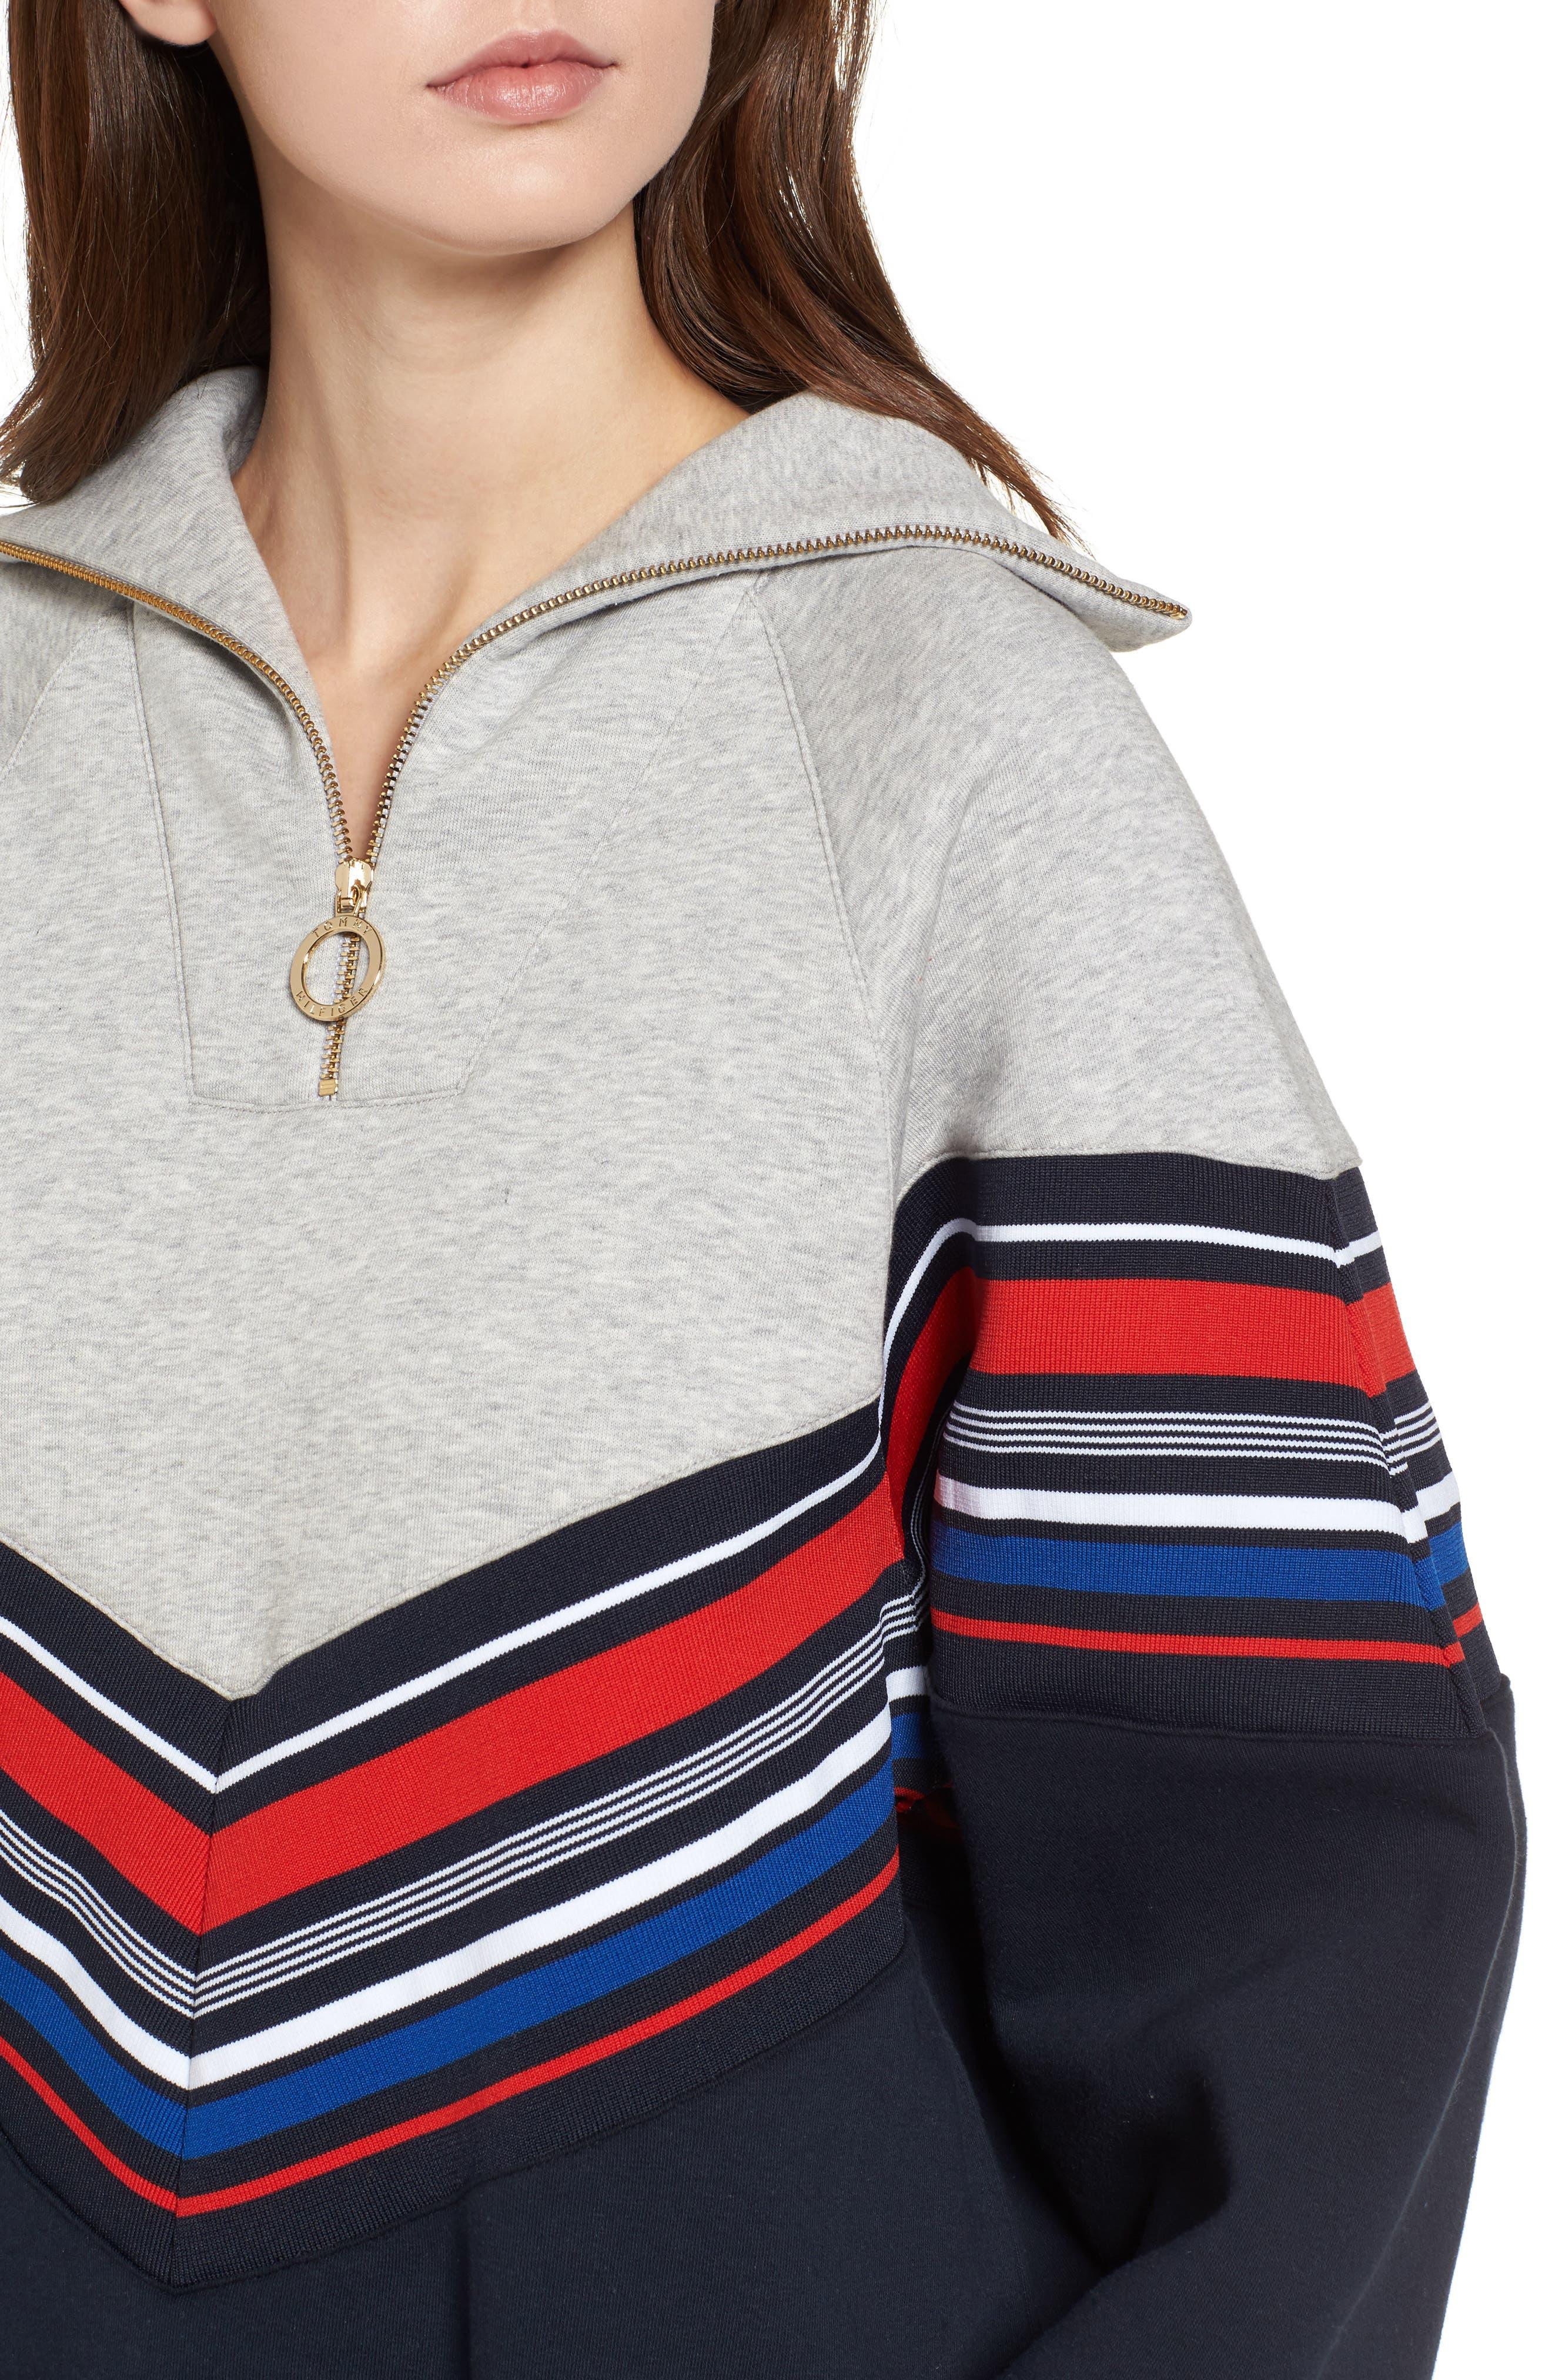 x Gigi Hadid Racing Sweatshirt Dress,                             Alternate thumbnail 4, color,                             405